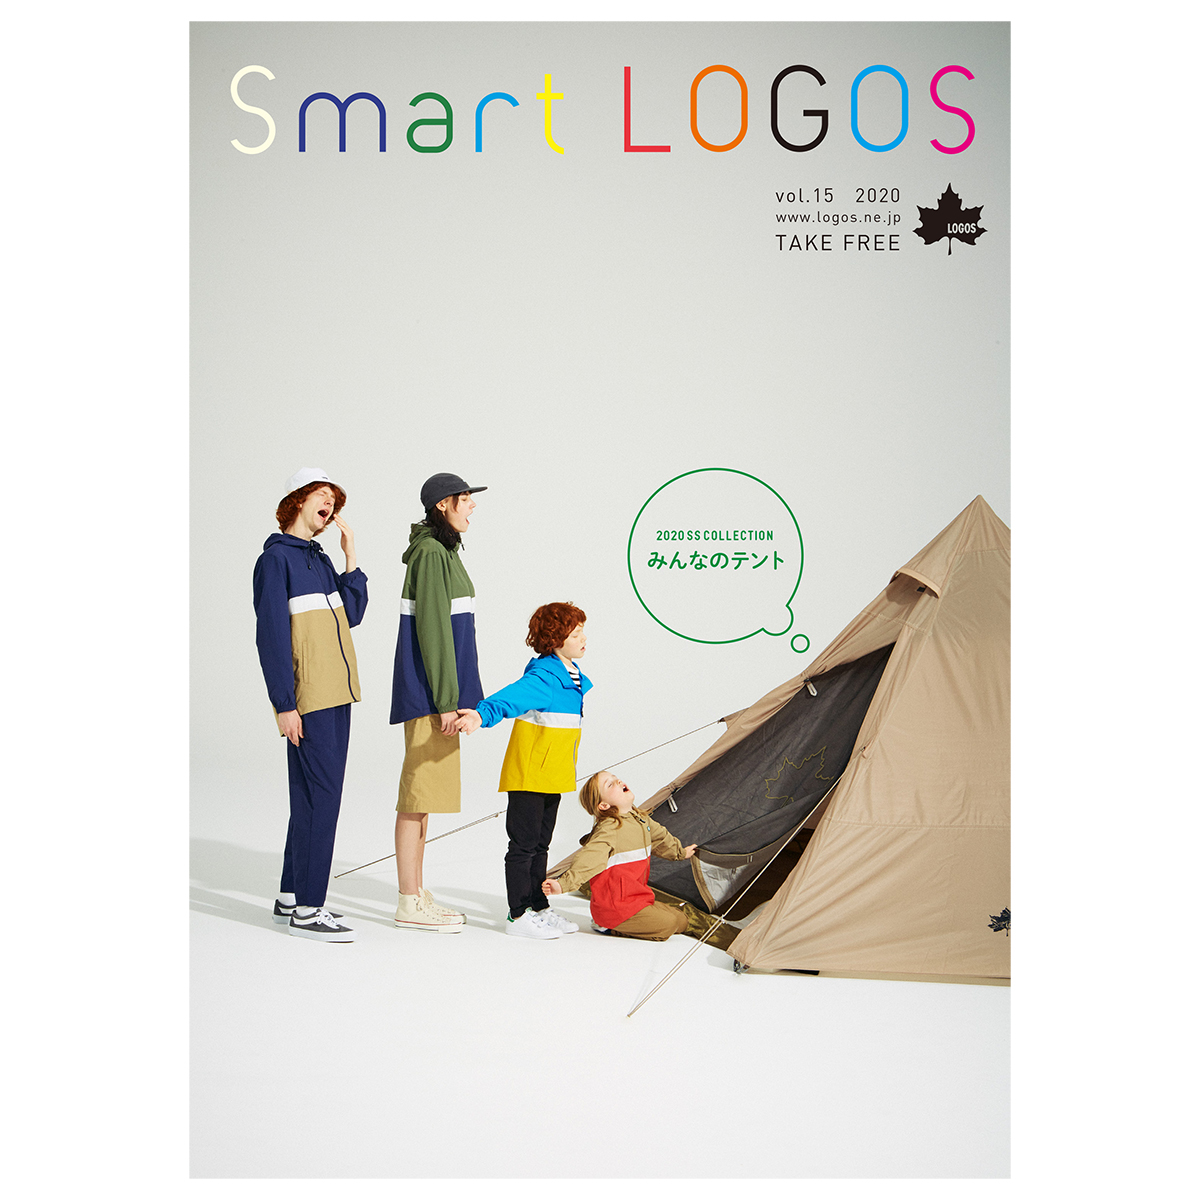 Smart LOGOS vol.15